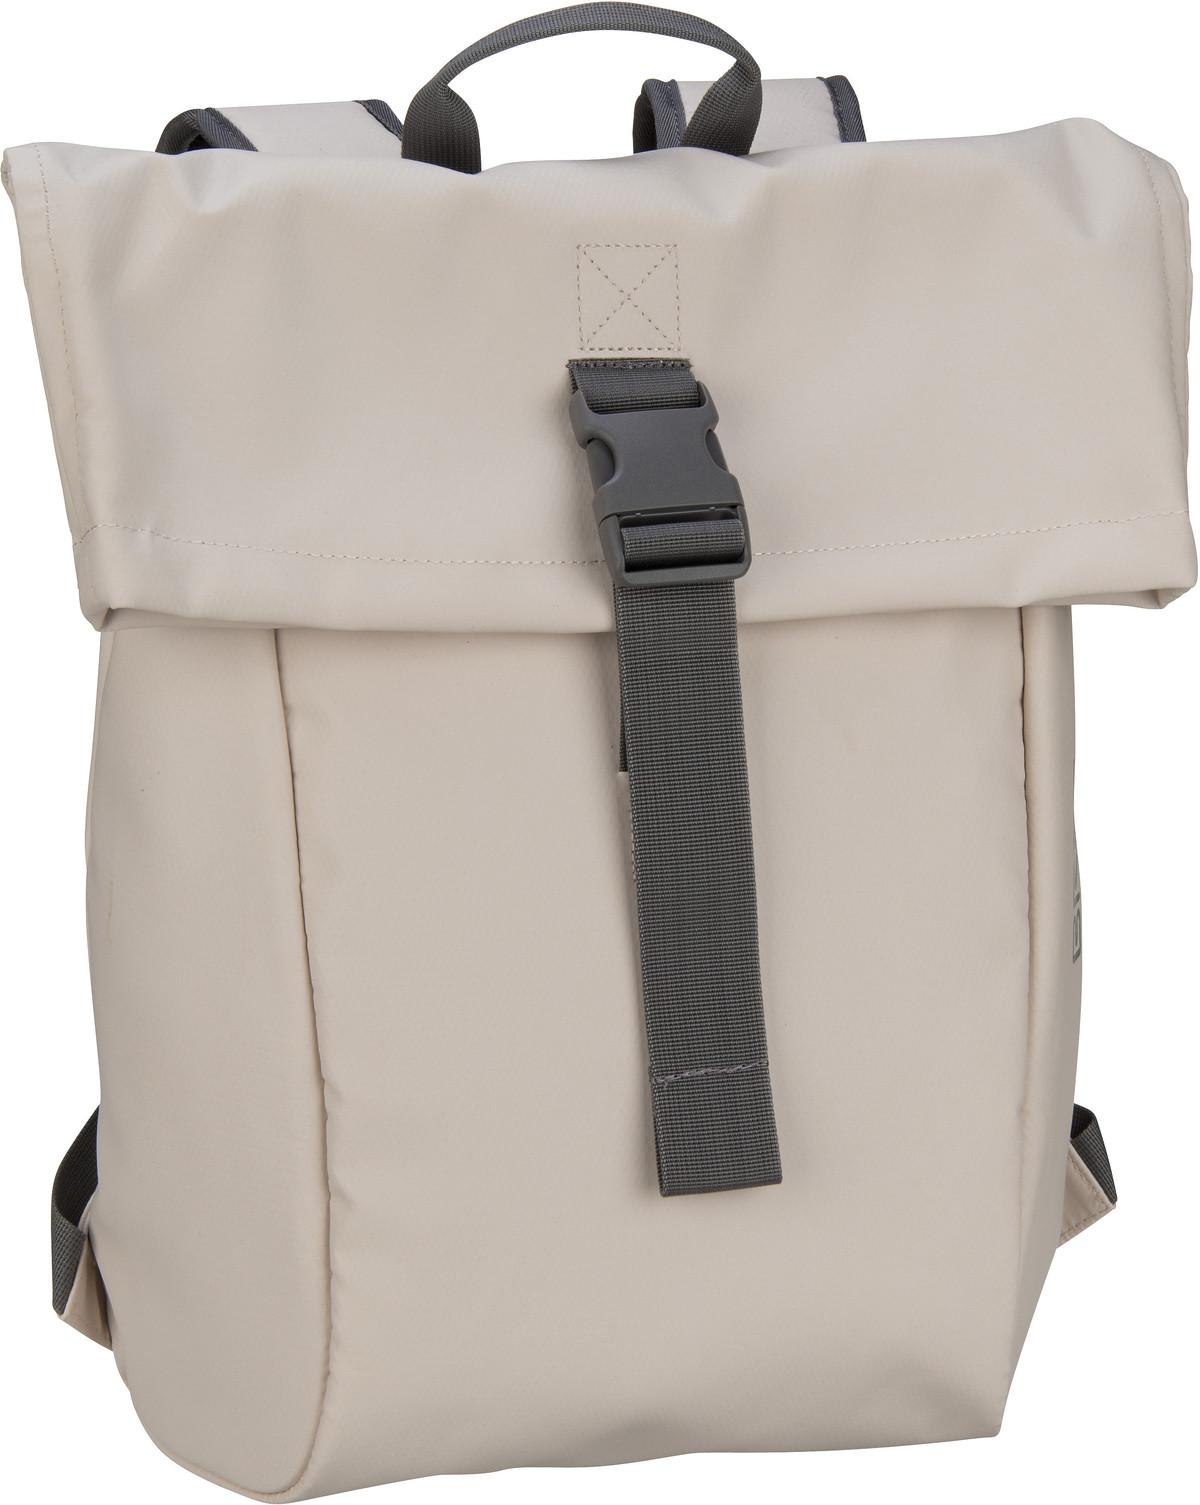 Rucksack / Daypack Punch 92 Tapioka (13 Liter)